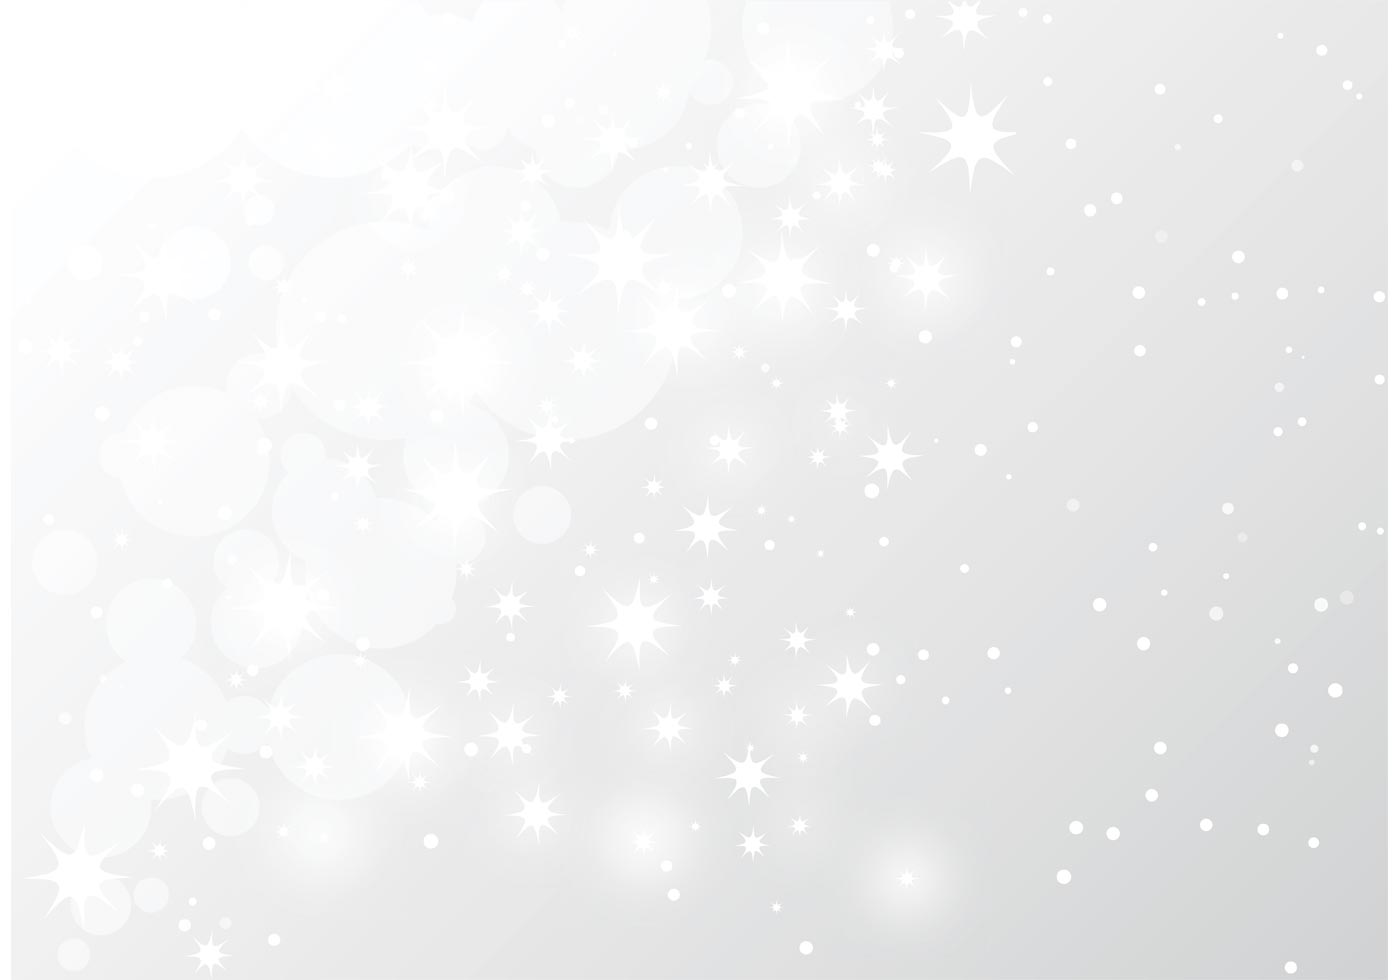 Silver Glitter Wallpaper Download Free Vectors Clipart